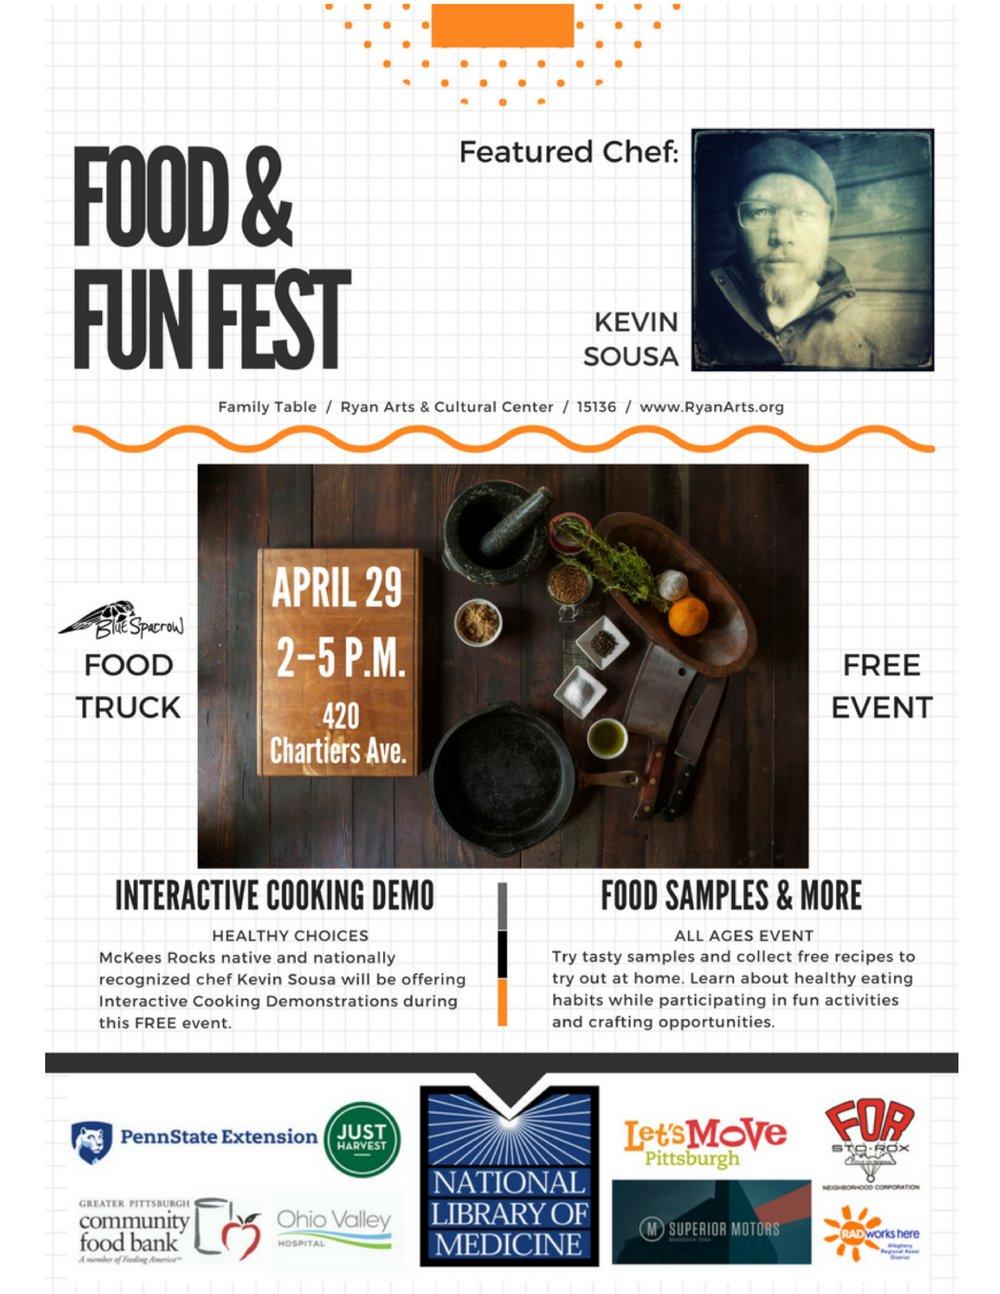 Food&FunFest Souza Picture.jpg